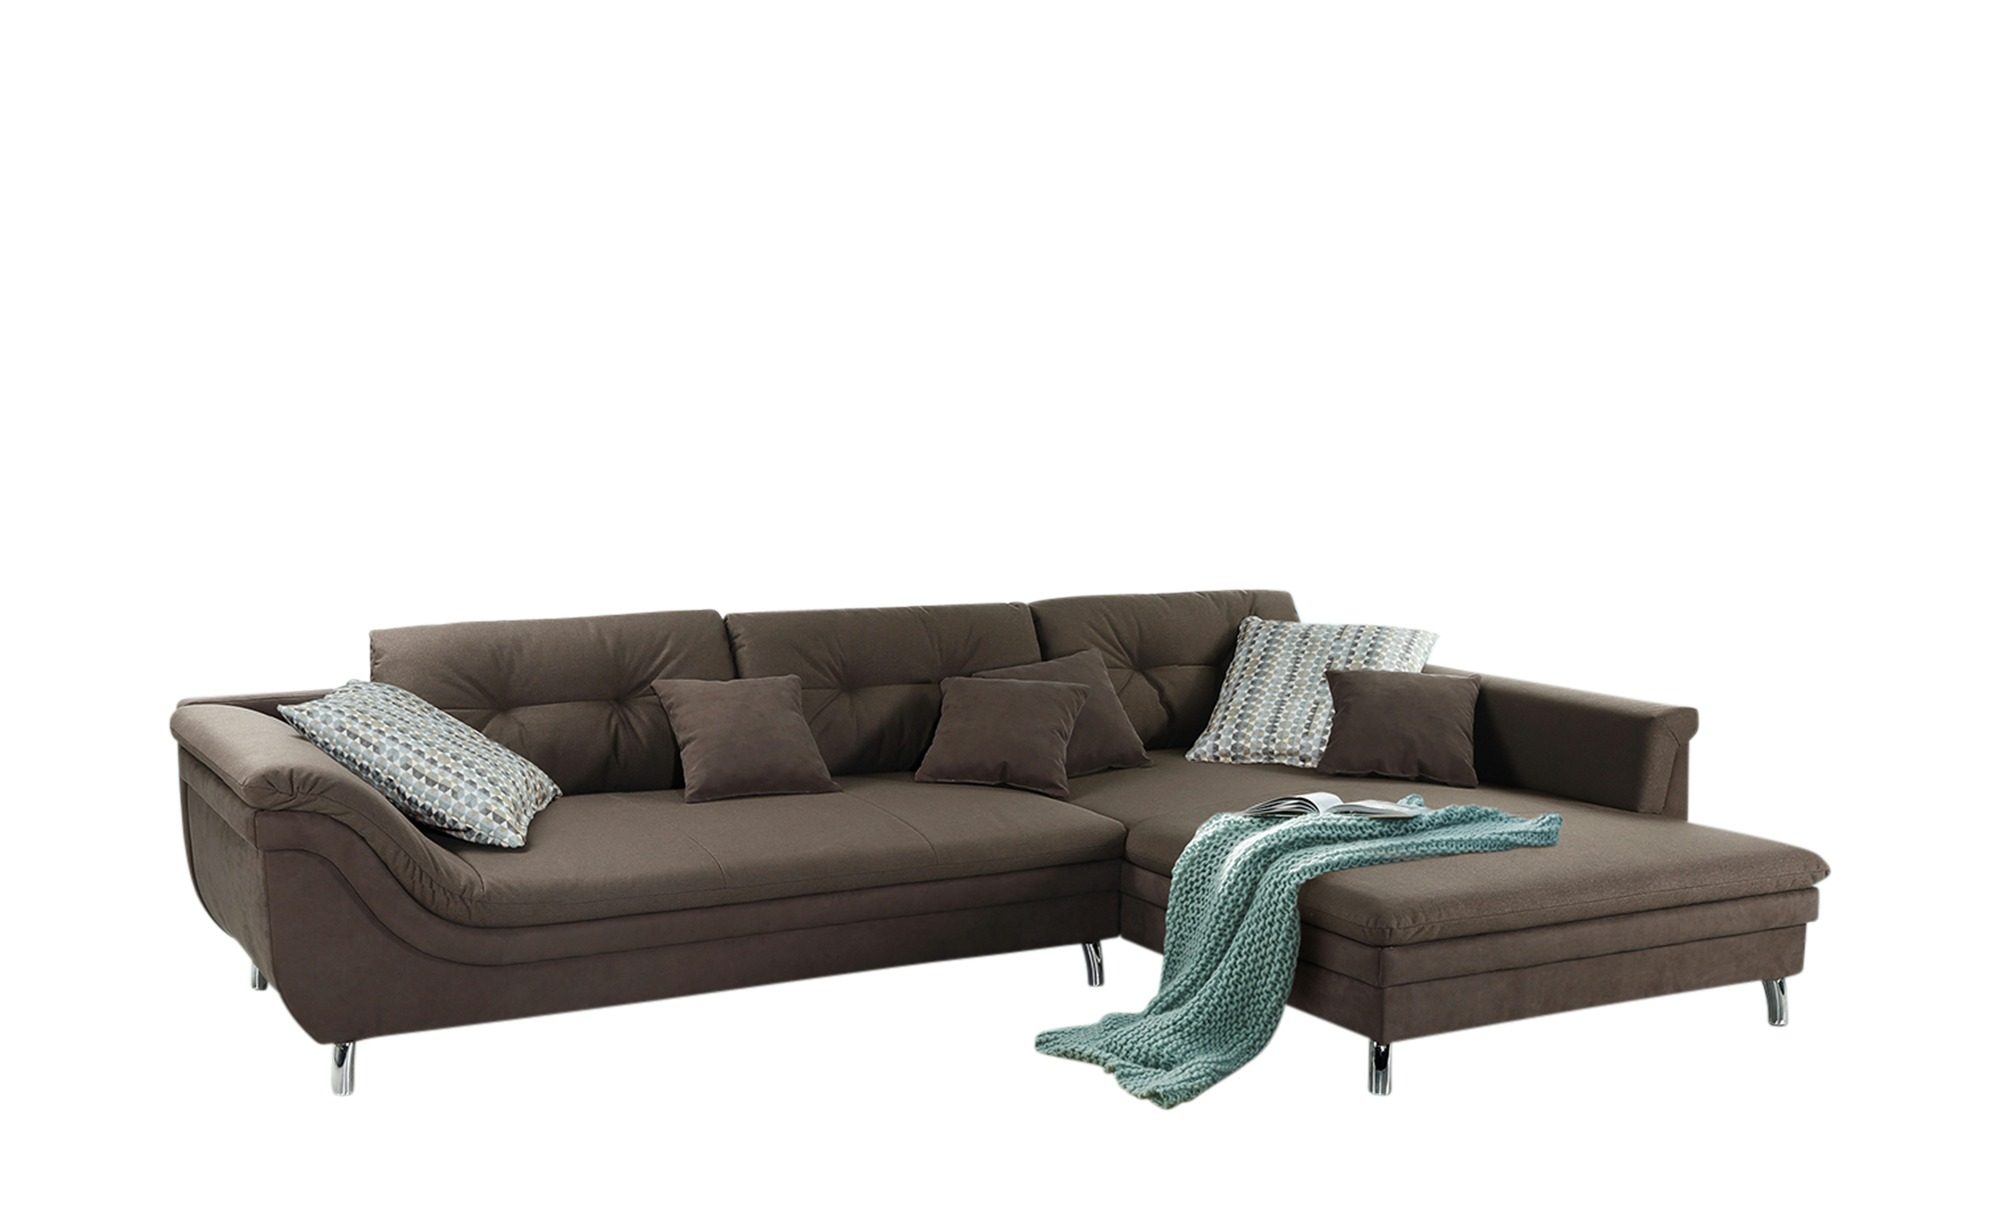 Big Sofa Kaufen Sofa Design L Shape Sofa Leder Weiss Erfahrungen